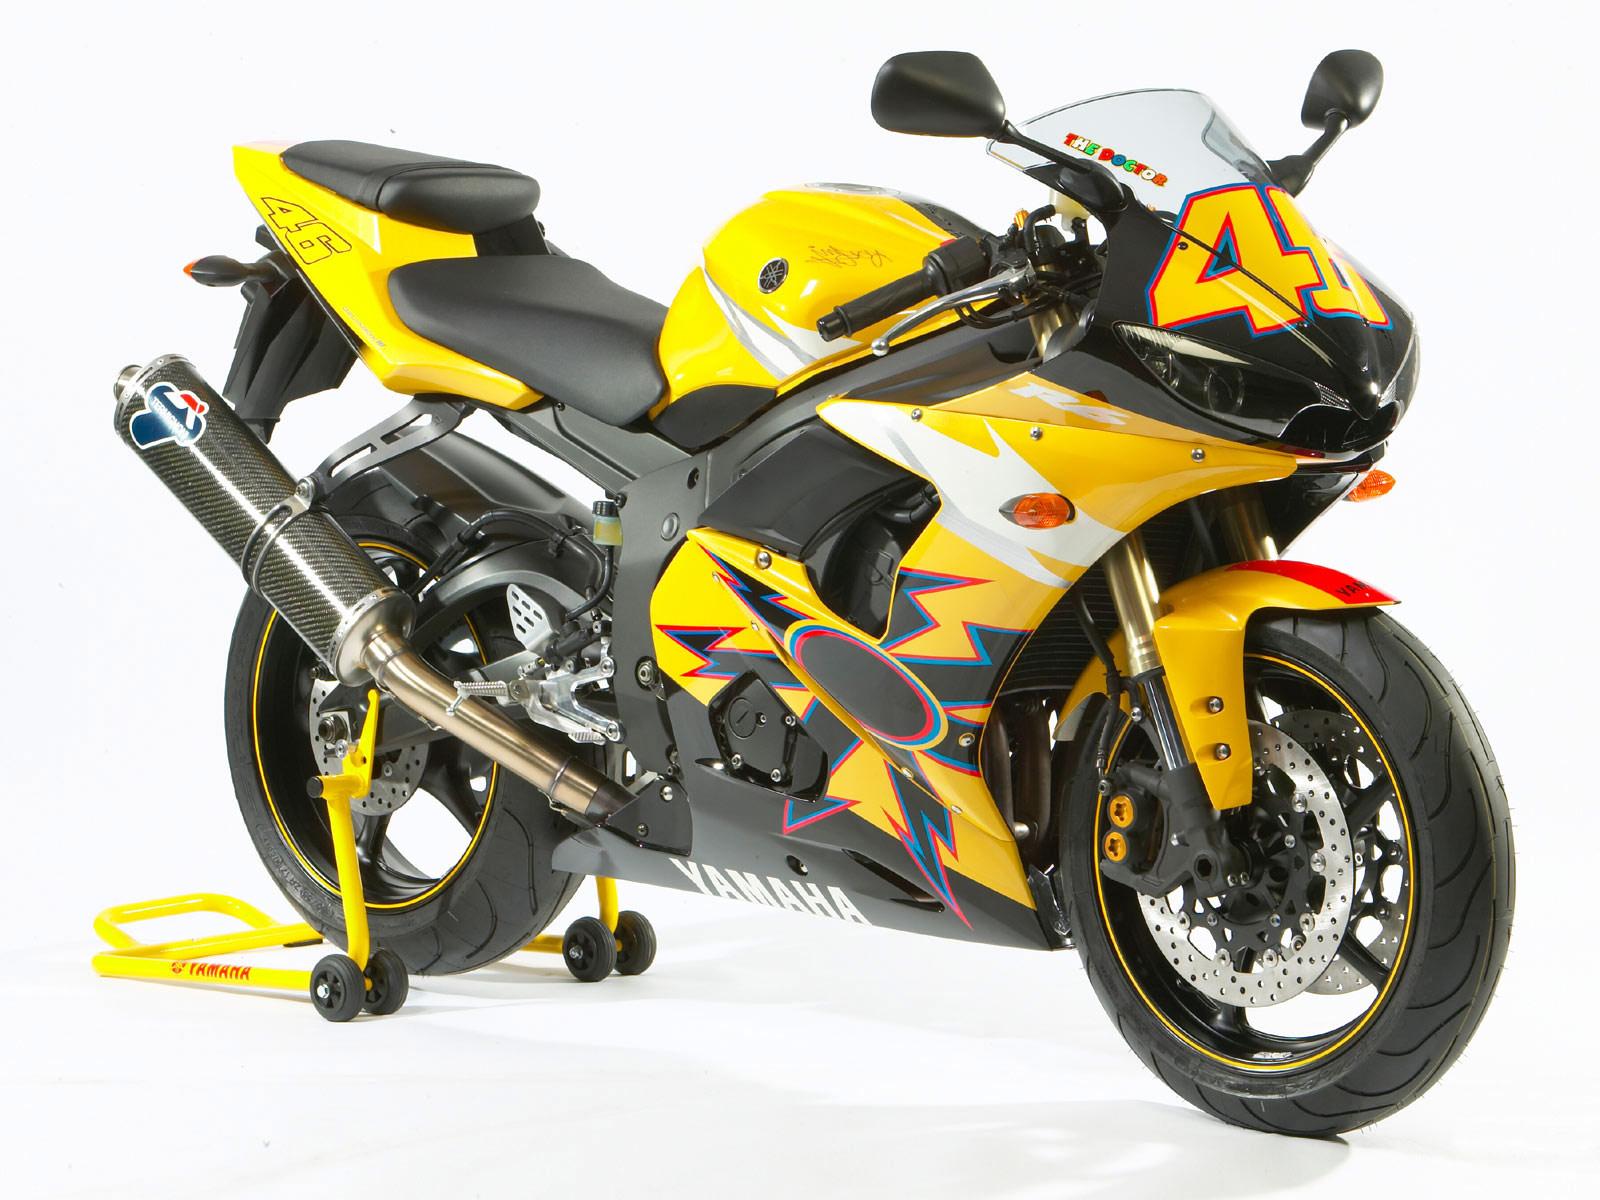 http://4.bp.blogspot.com/-uWrENKxqe5g/Ts3gDIbJpSI/AAAAAAAAEtY/xS_ykiRAsL0/s1600/2005-YAMAHA-YZF-R6-R46_motorcycle-desktop-wallpaper_2.jpg